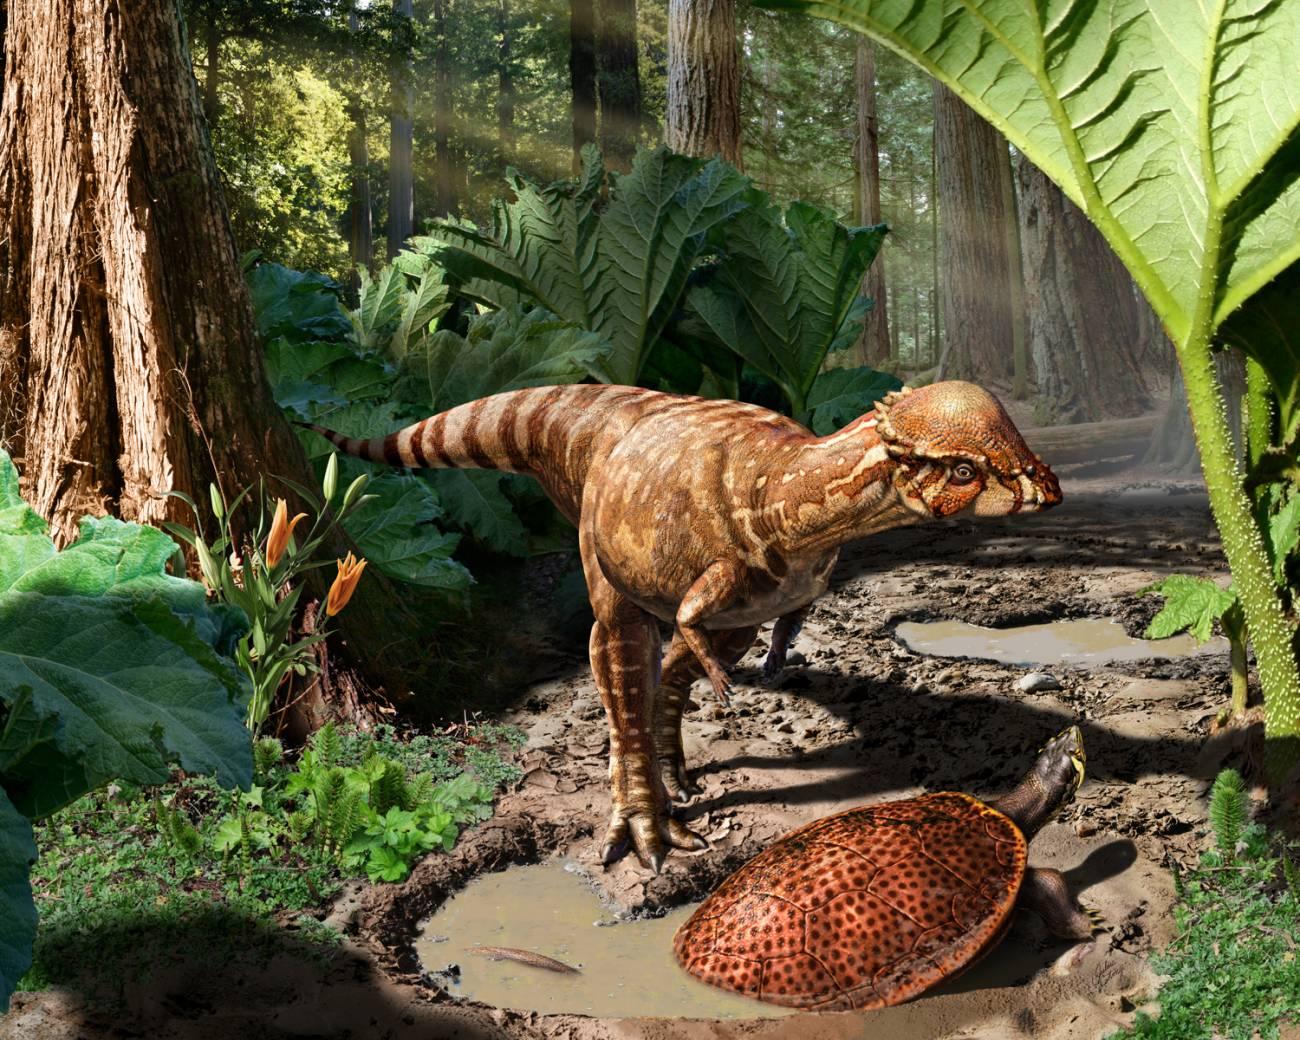 Recreación artística del dinosaurio Acrotholus audeti / Julius Csotonyi, Nature.